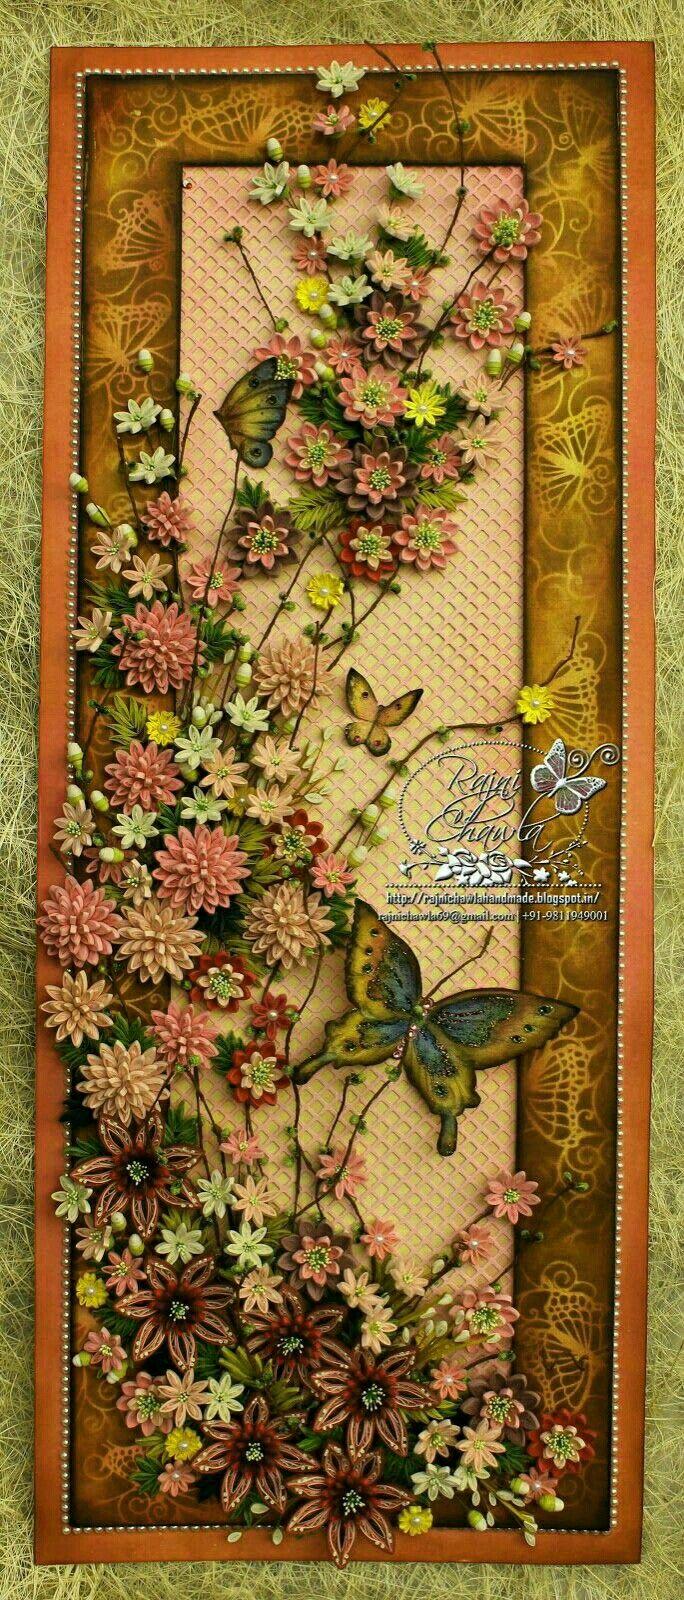 Pin by Sukran Bayraktar on Kağıt kıvırma | Pinterest | Flower crafts ...